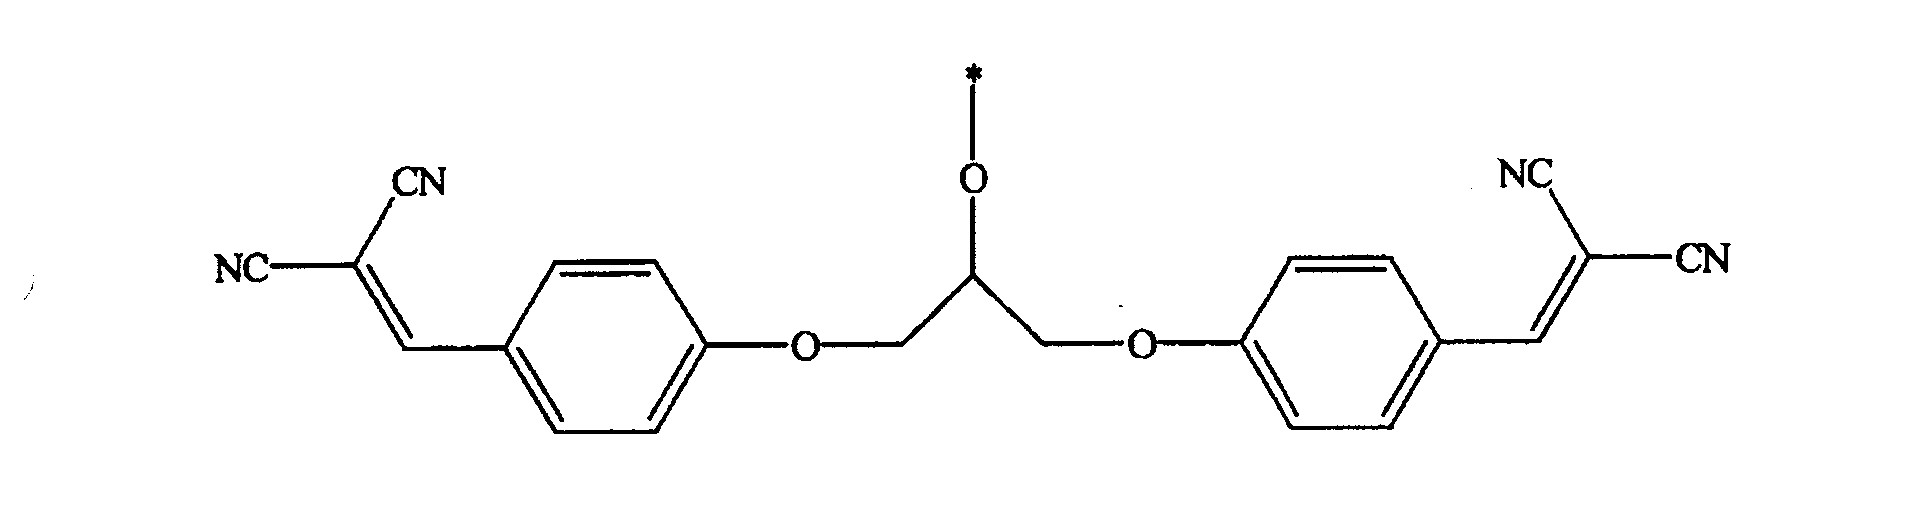 Figure 712011001004300-pct00054